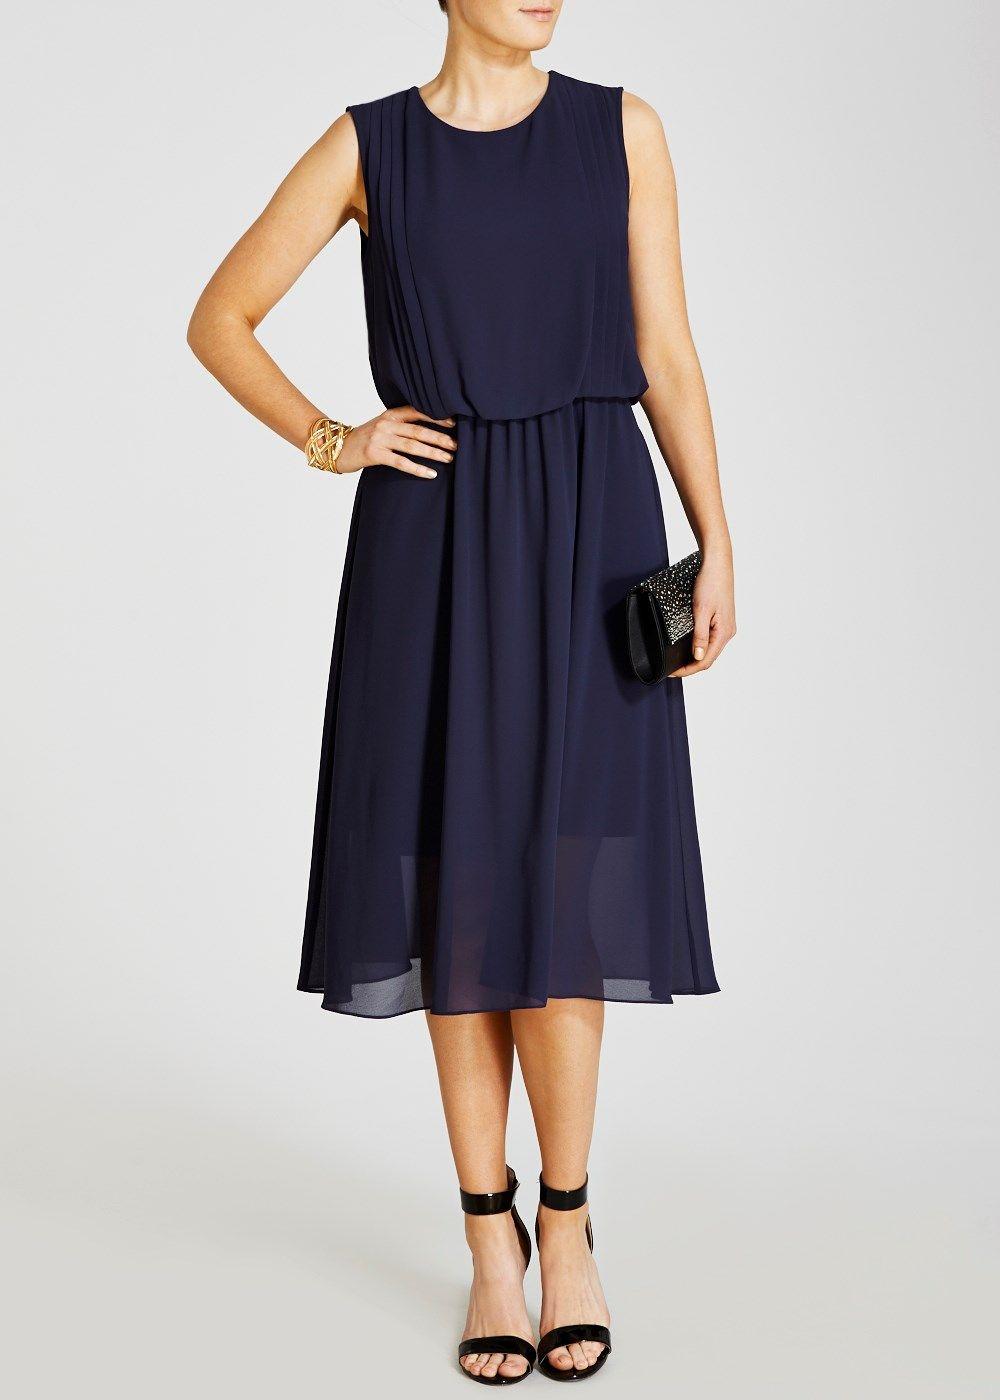 Fit and Flare Dress - Matalan | Fashion | Pinterest | Fashion